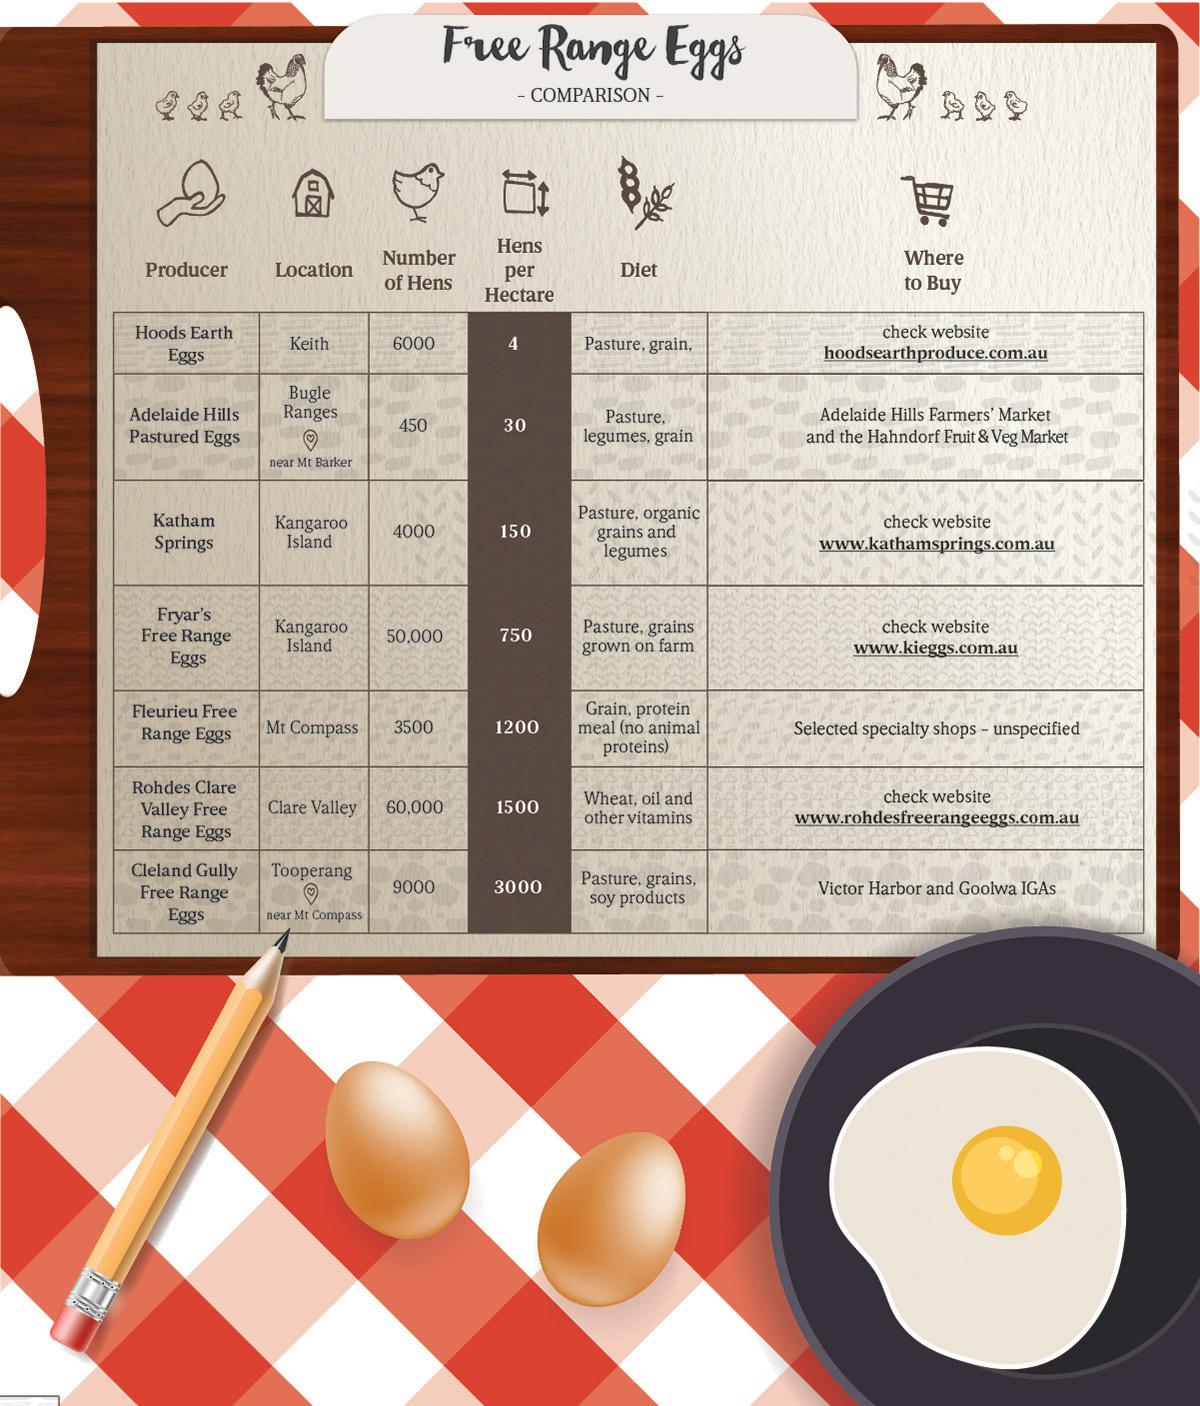 SA free-range egg producers. Illustration: Leah Zahorujko / InDaily